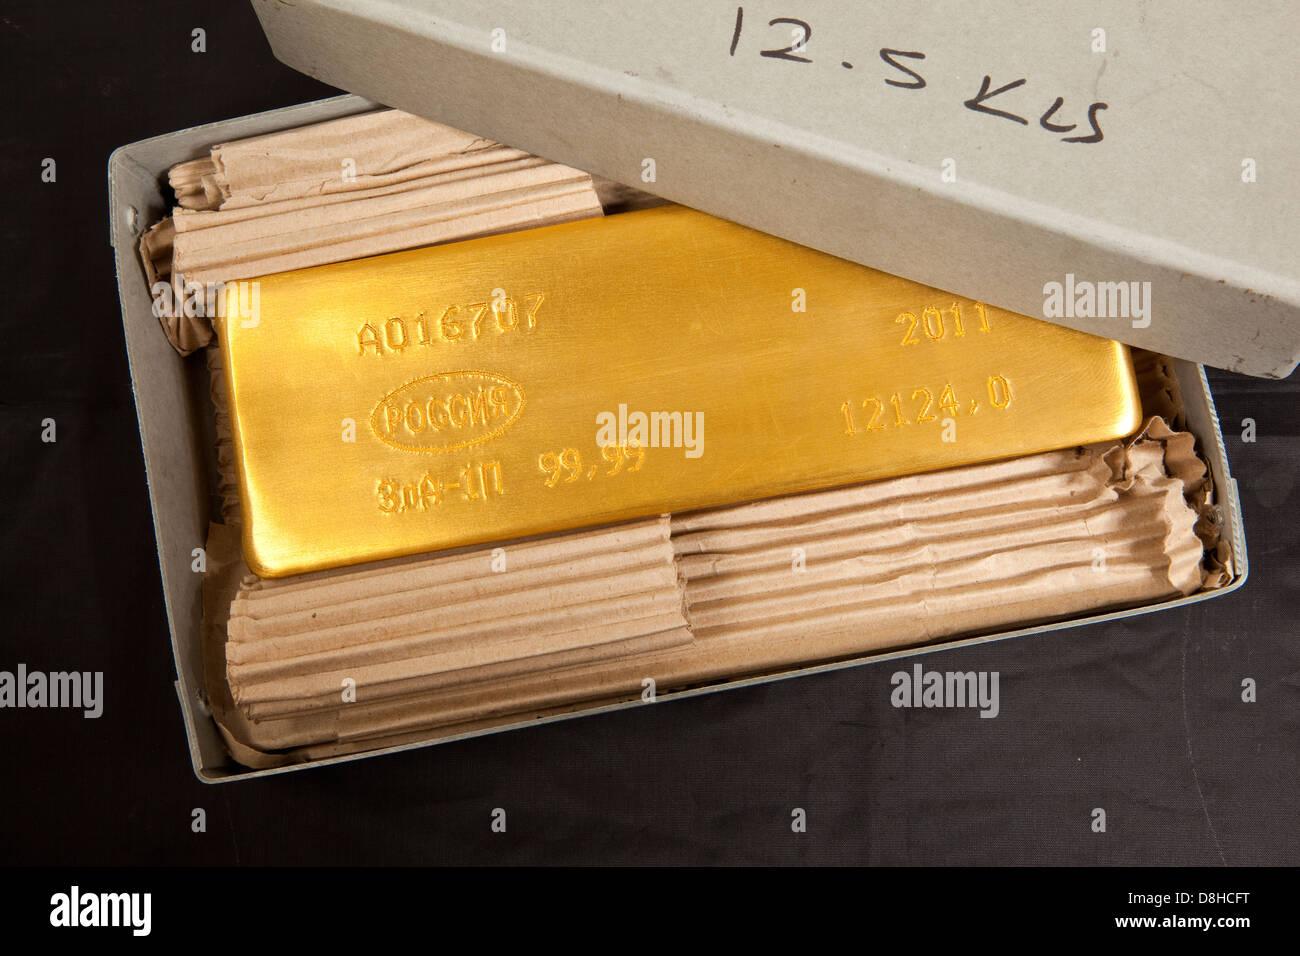 Gold bar ingot in Hatton Garden Gold Dealer London England Photo Credit: David Levenson - Stock Image